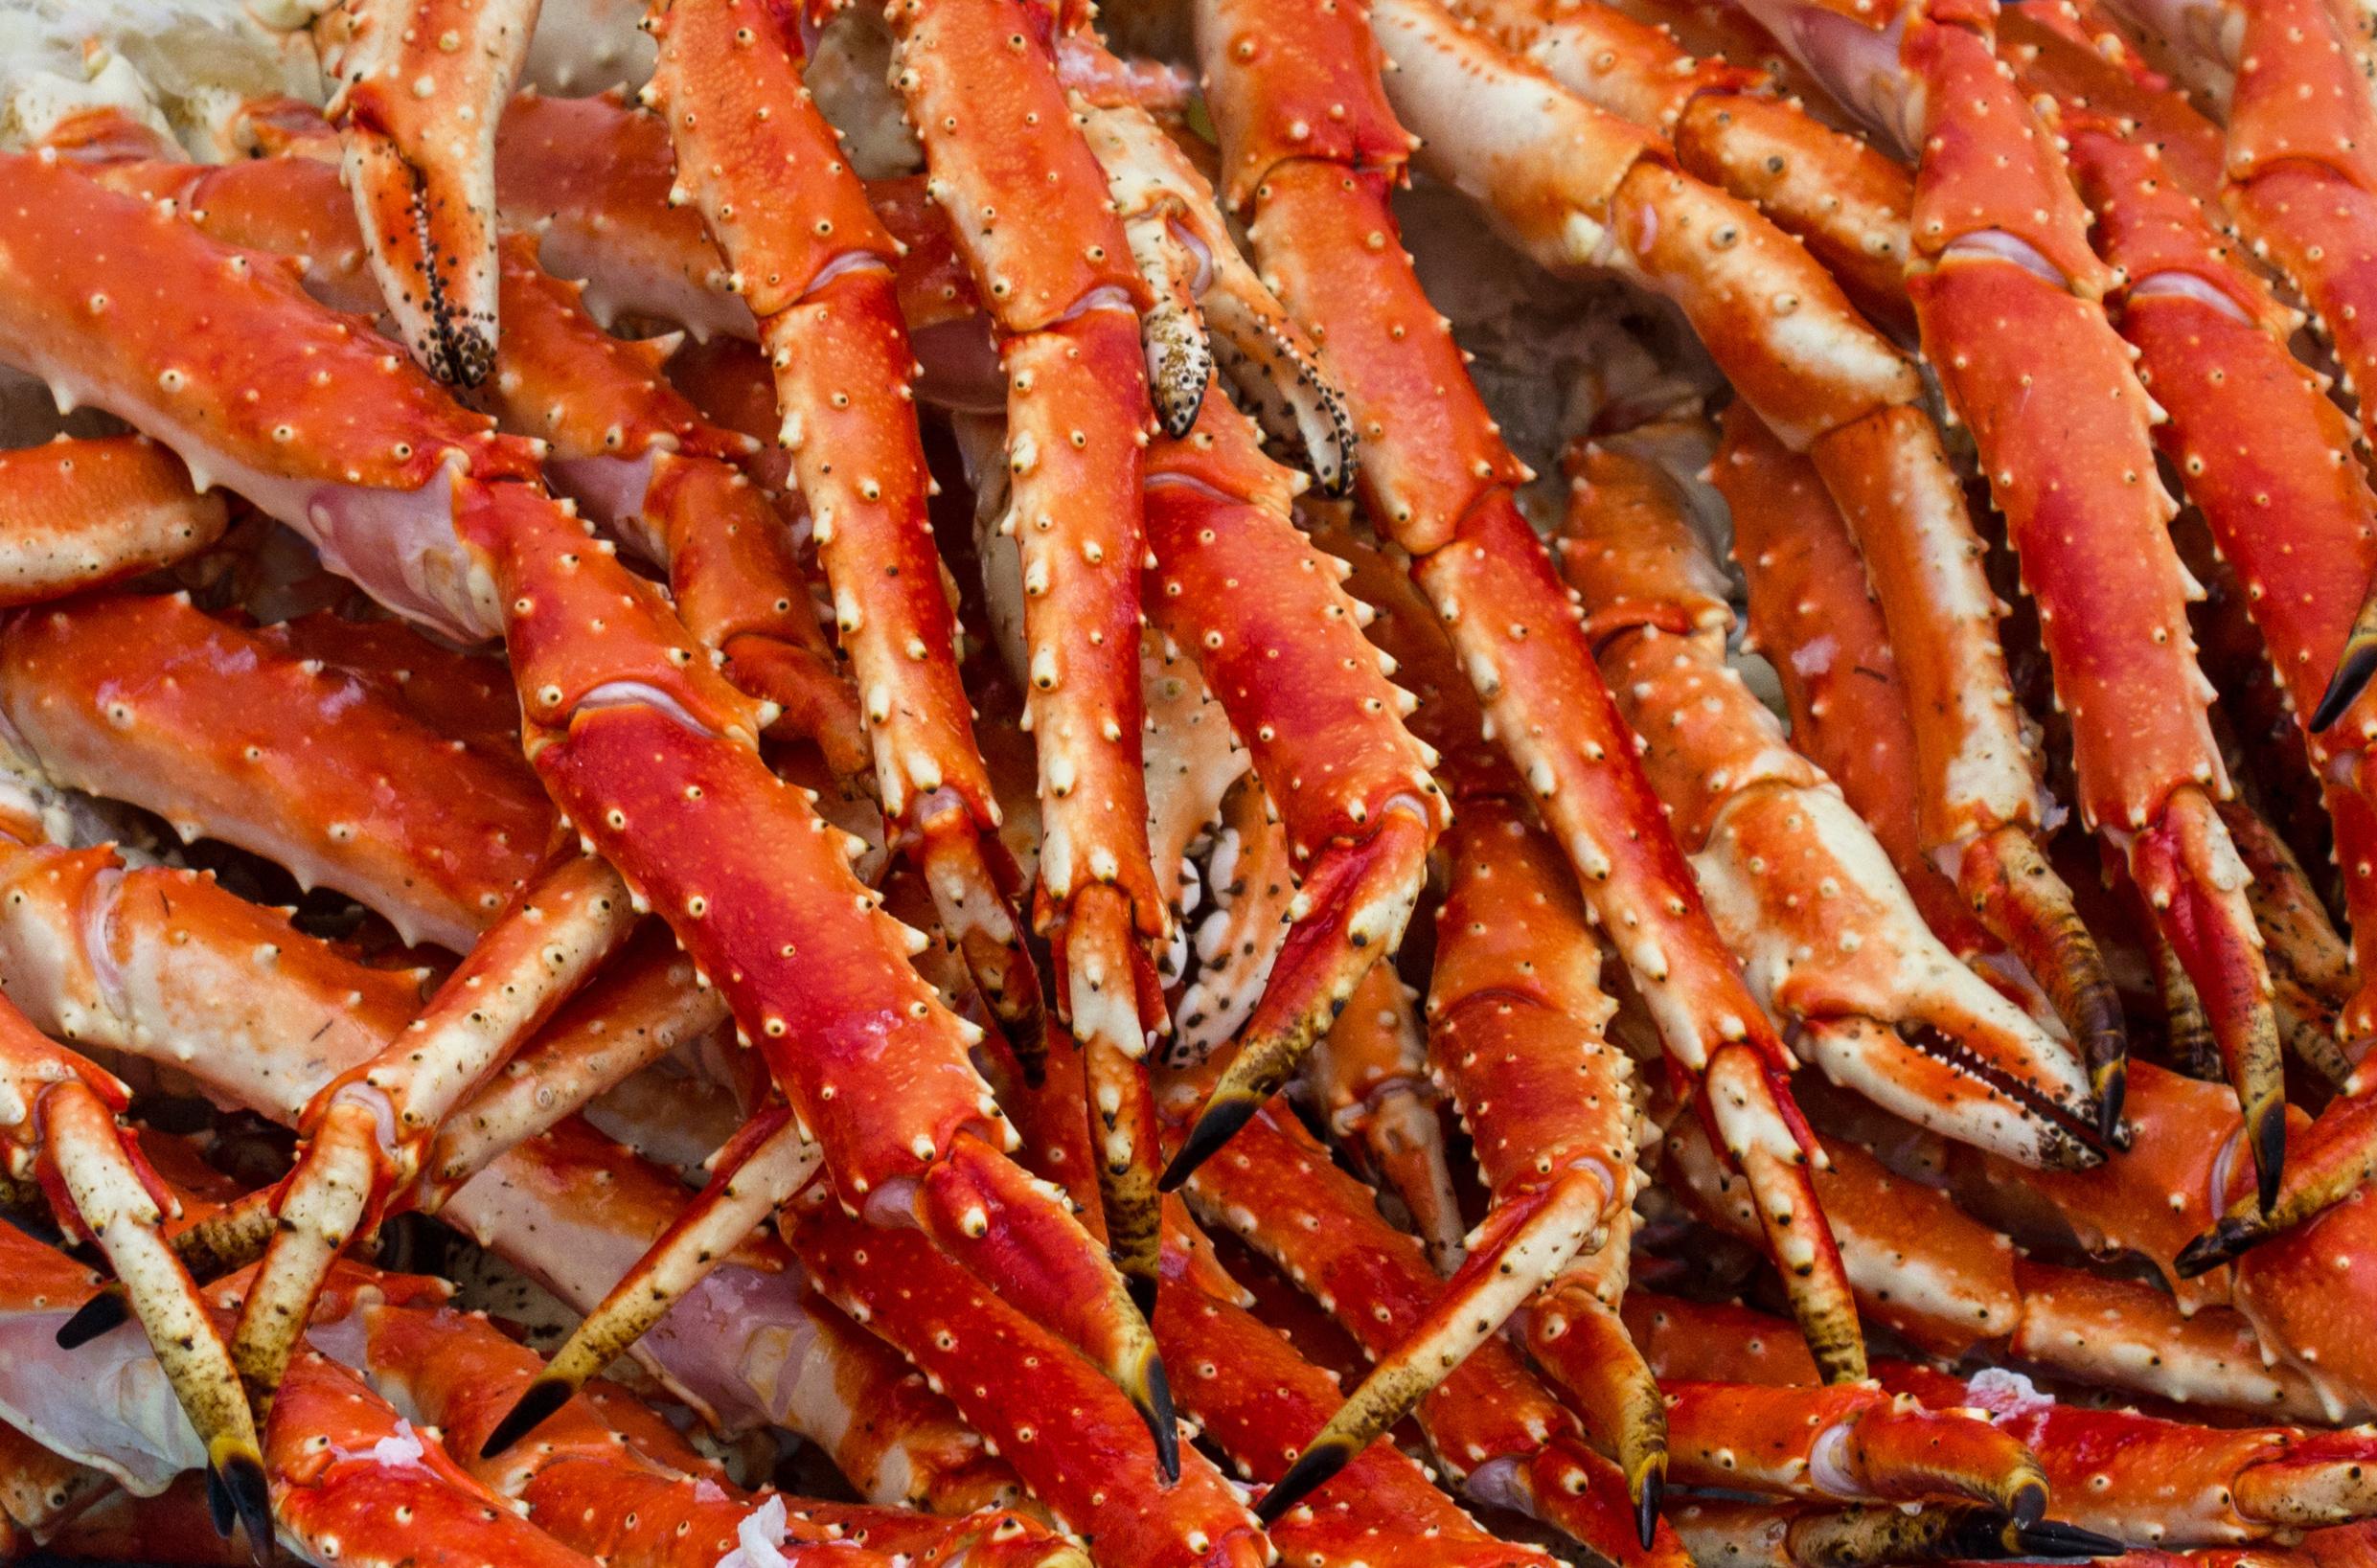 king-crab-legs.jpg